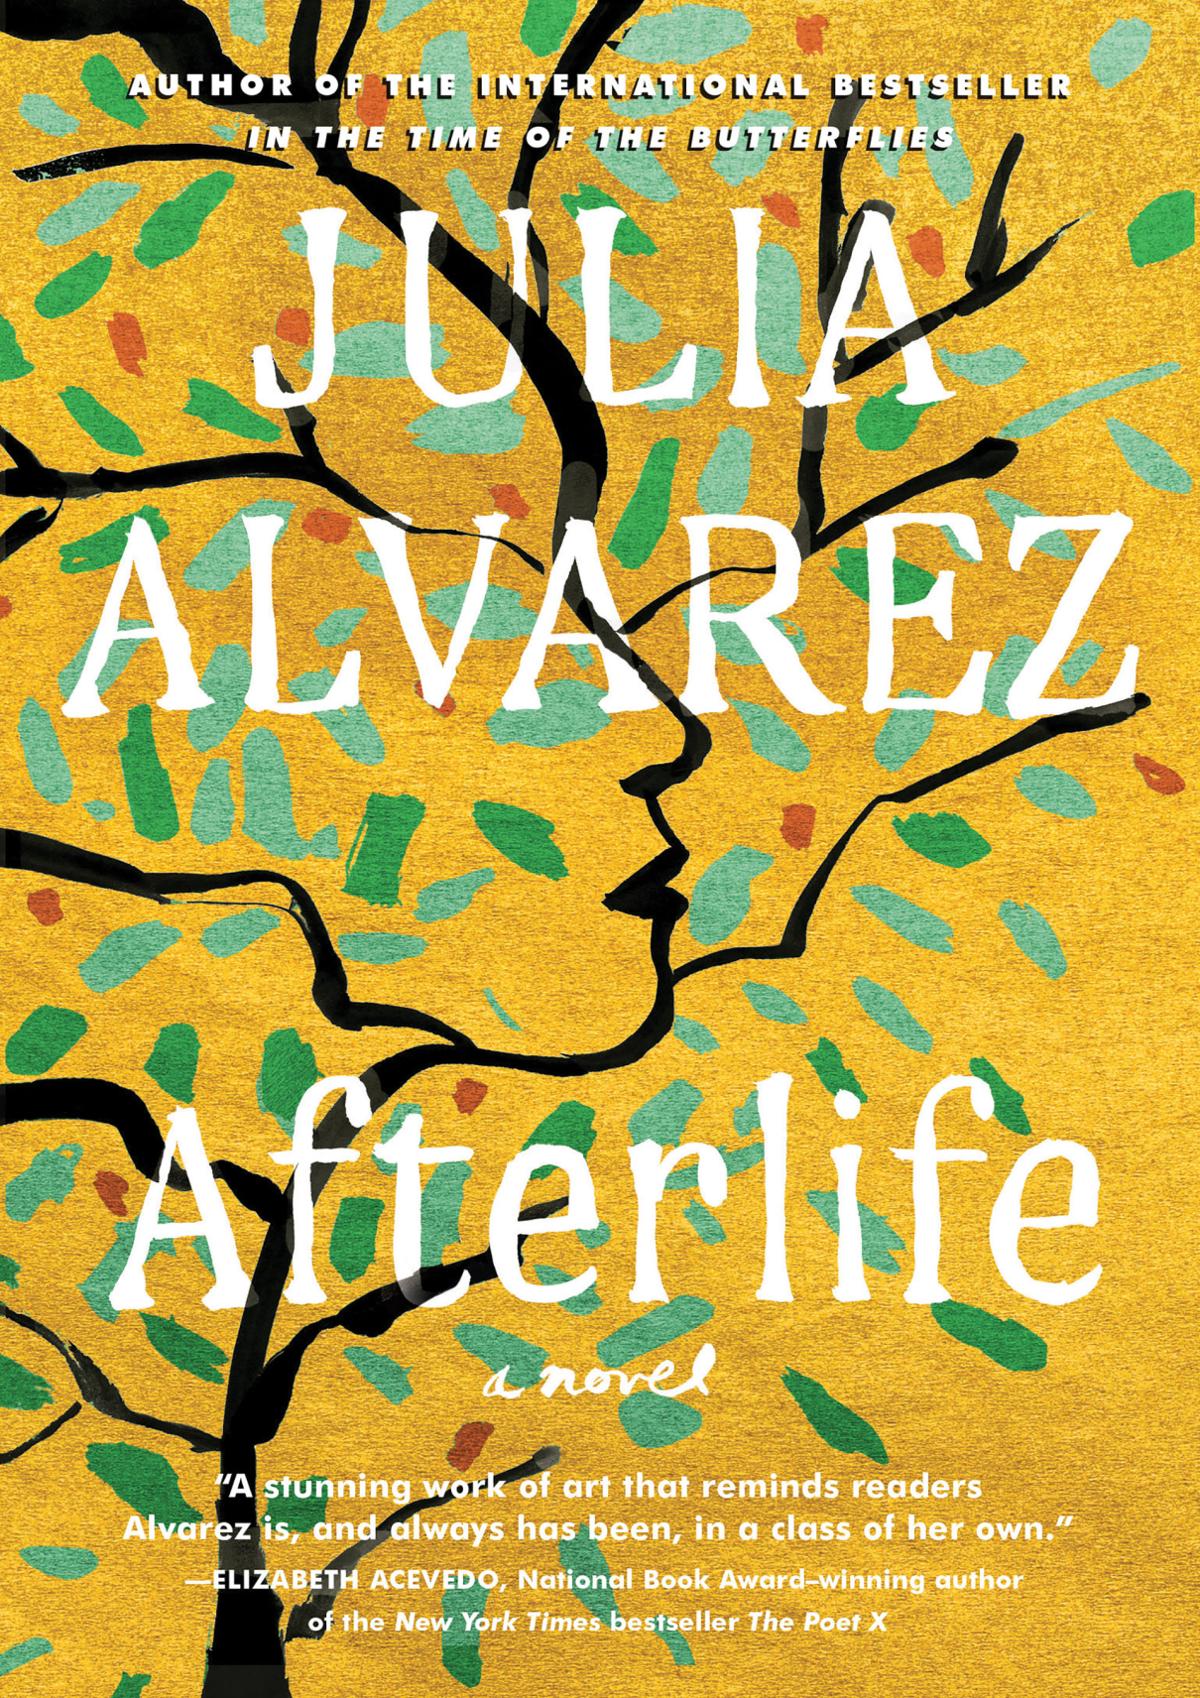 Julia Alvarez on Sisterhood, Global Community and Living by Metaphor